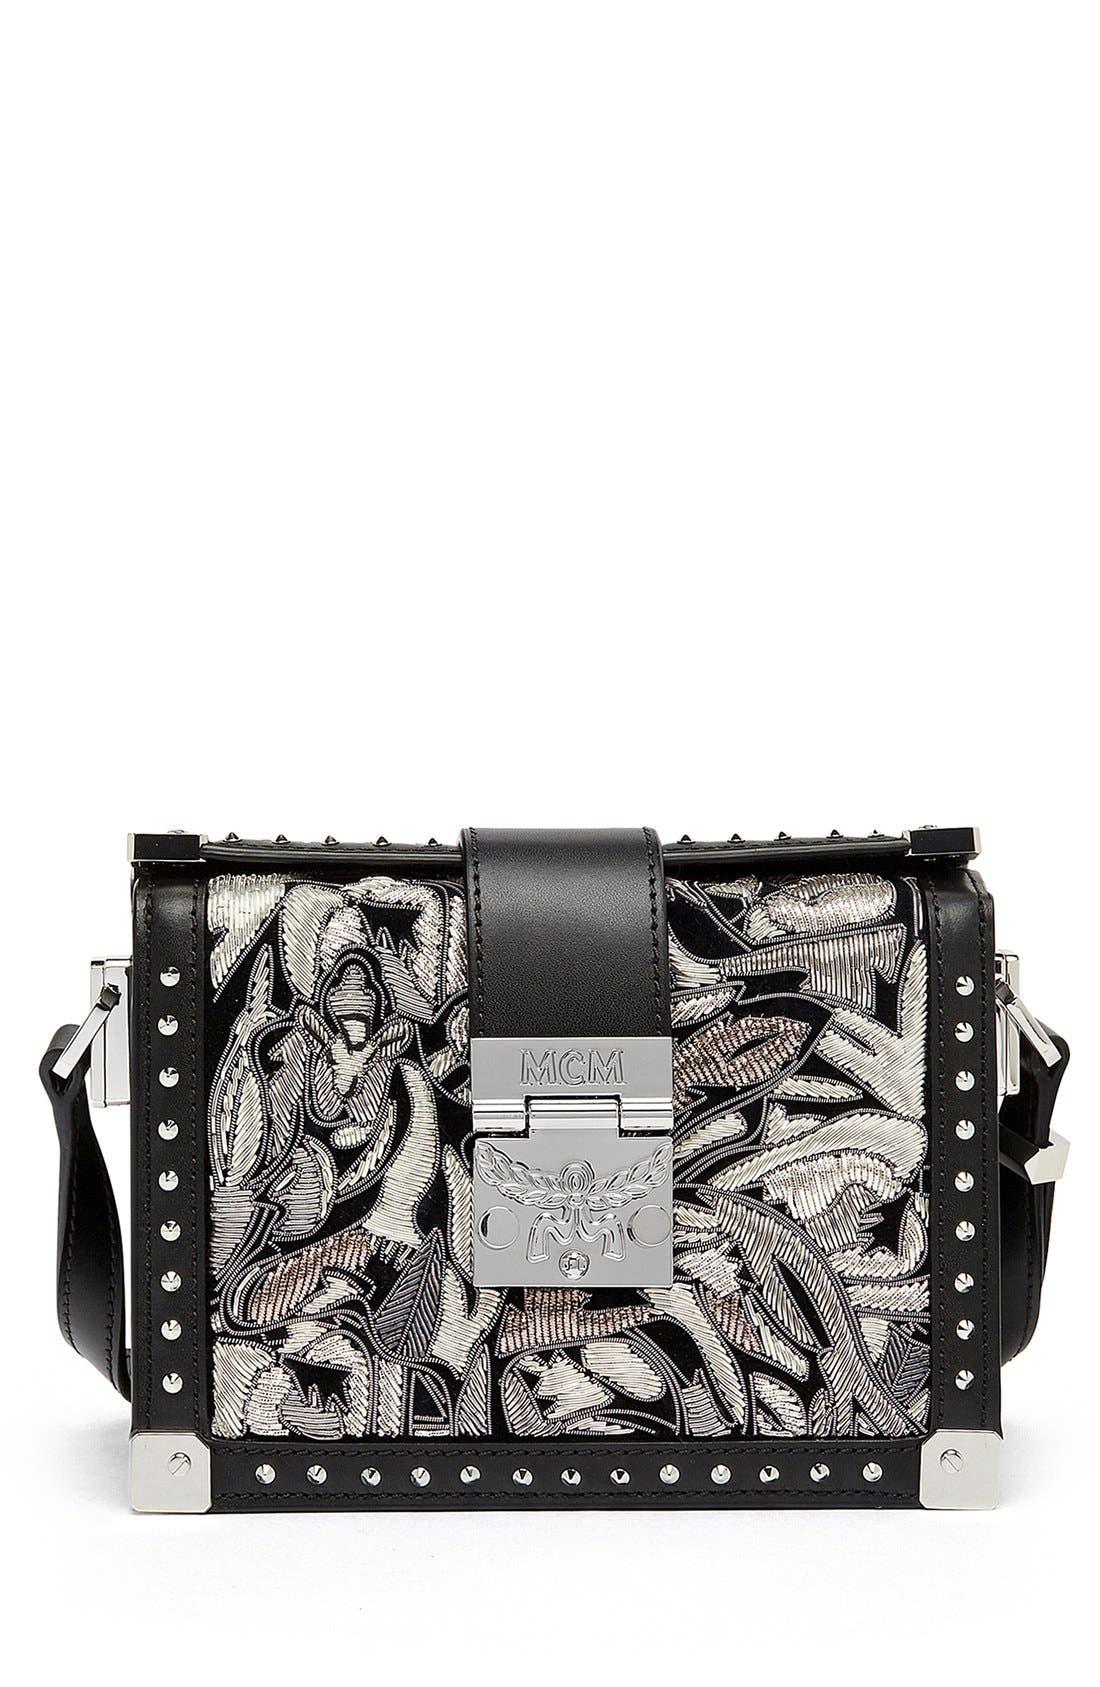 Alternate Image 1 Selected - MCM 'Mini Mitte - Brocade' Embellished Leather Crossbody Bag